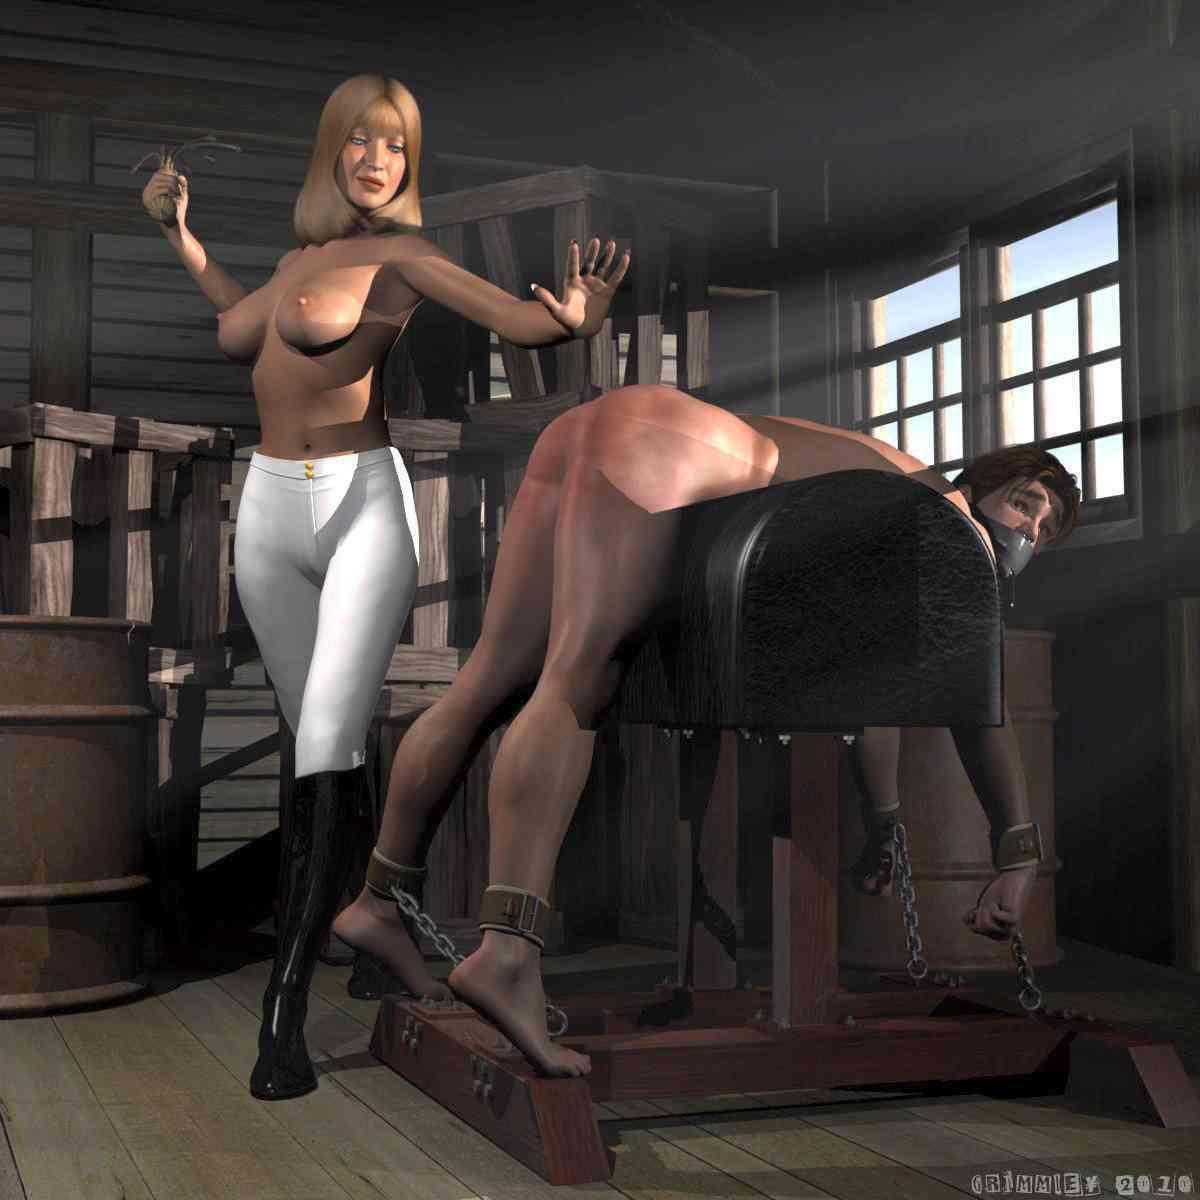 Dominatrix who spank